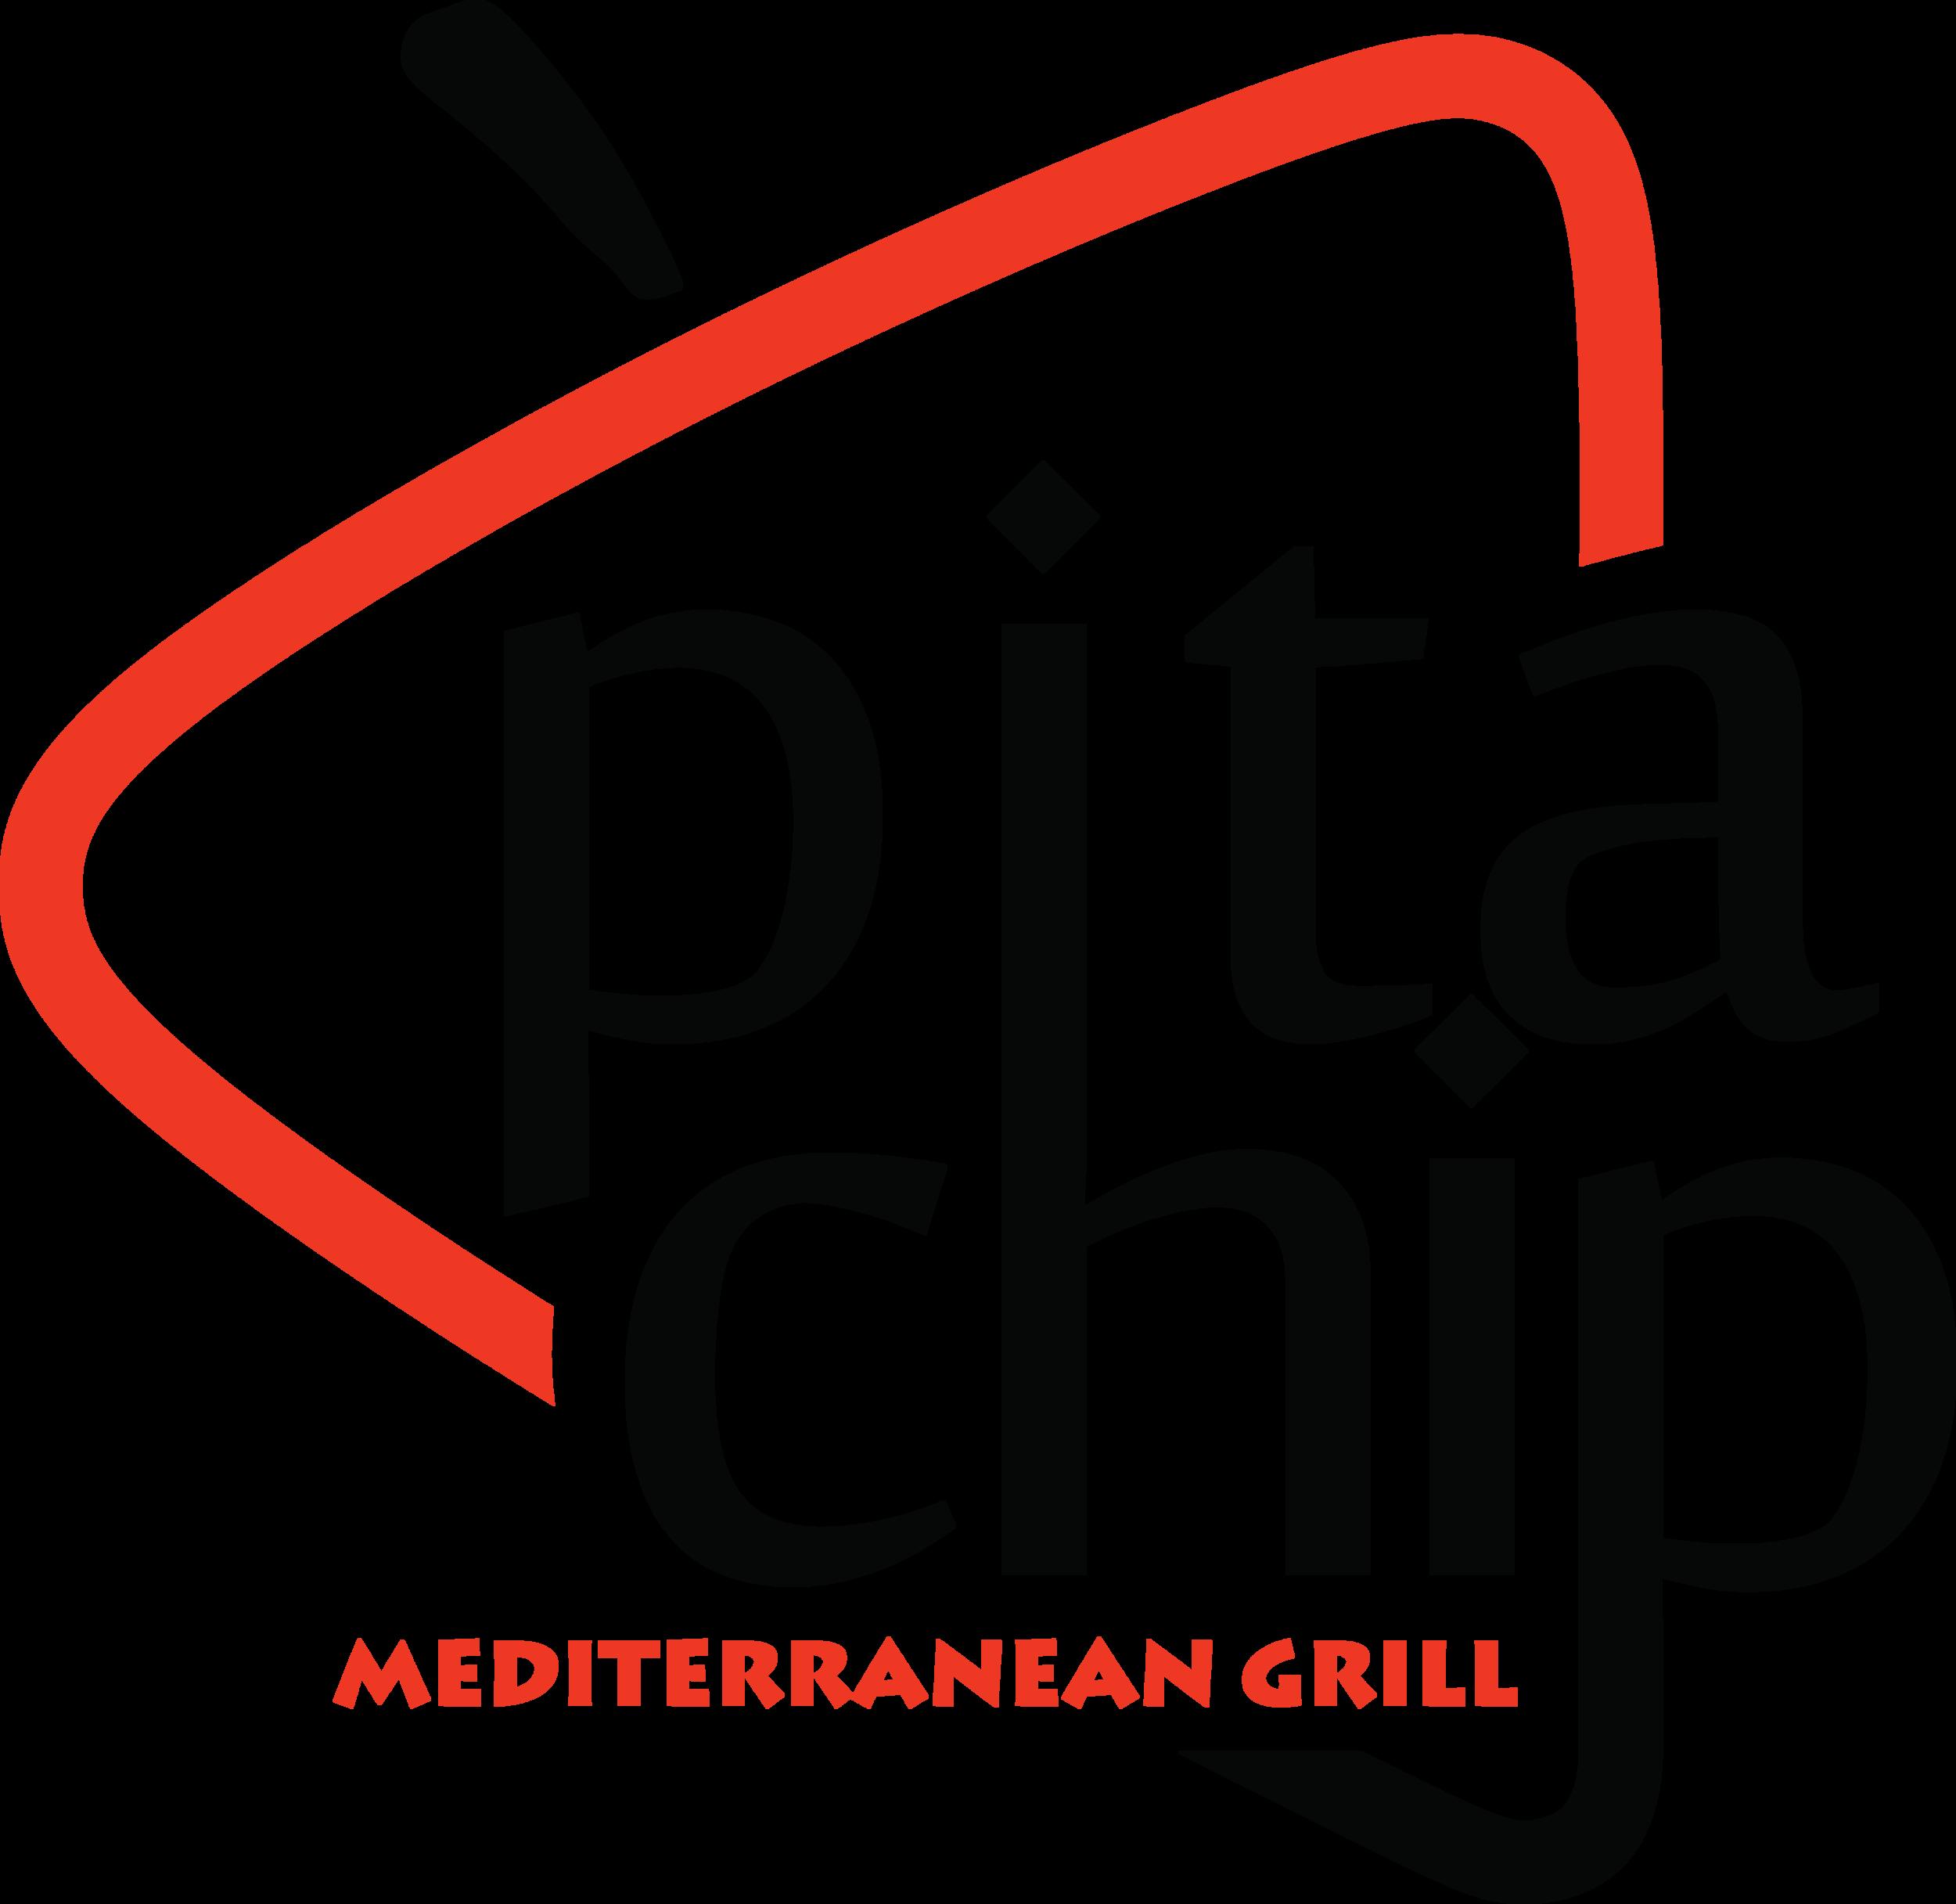 PITA CHIP final design 1.png